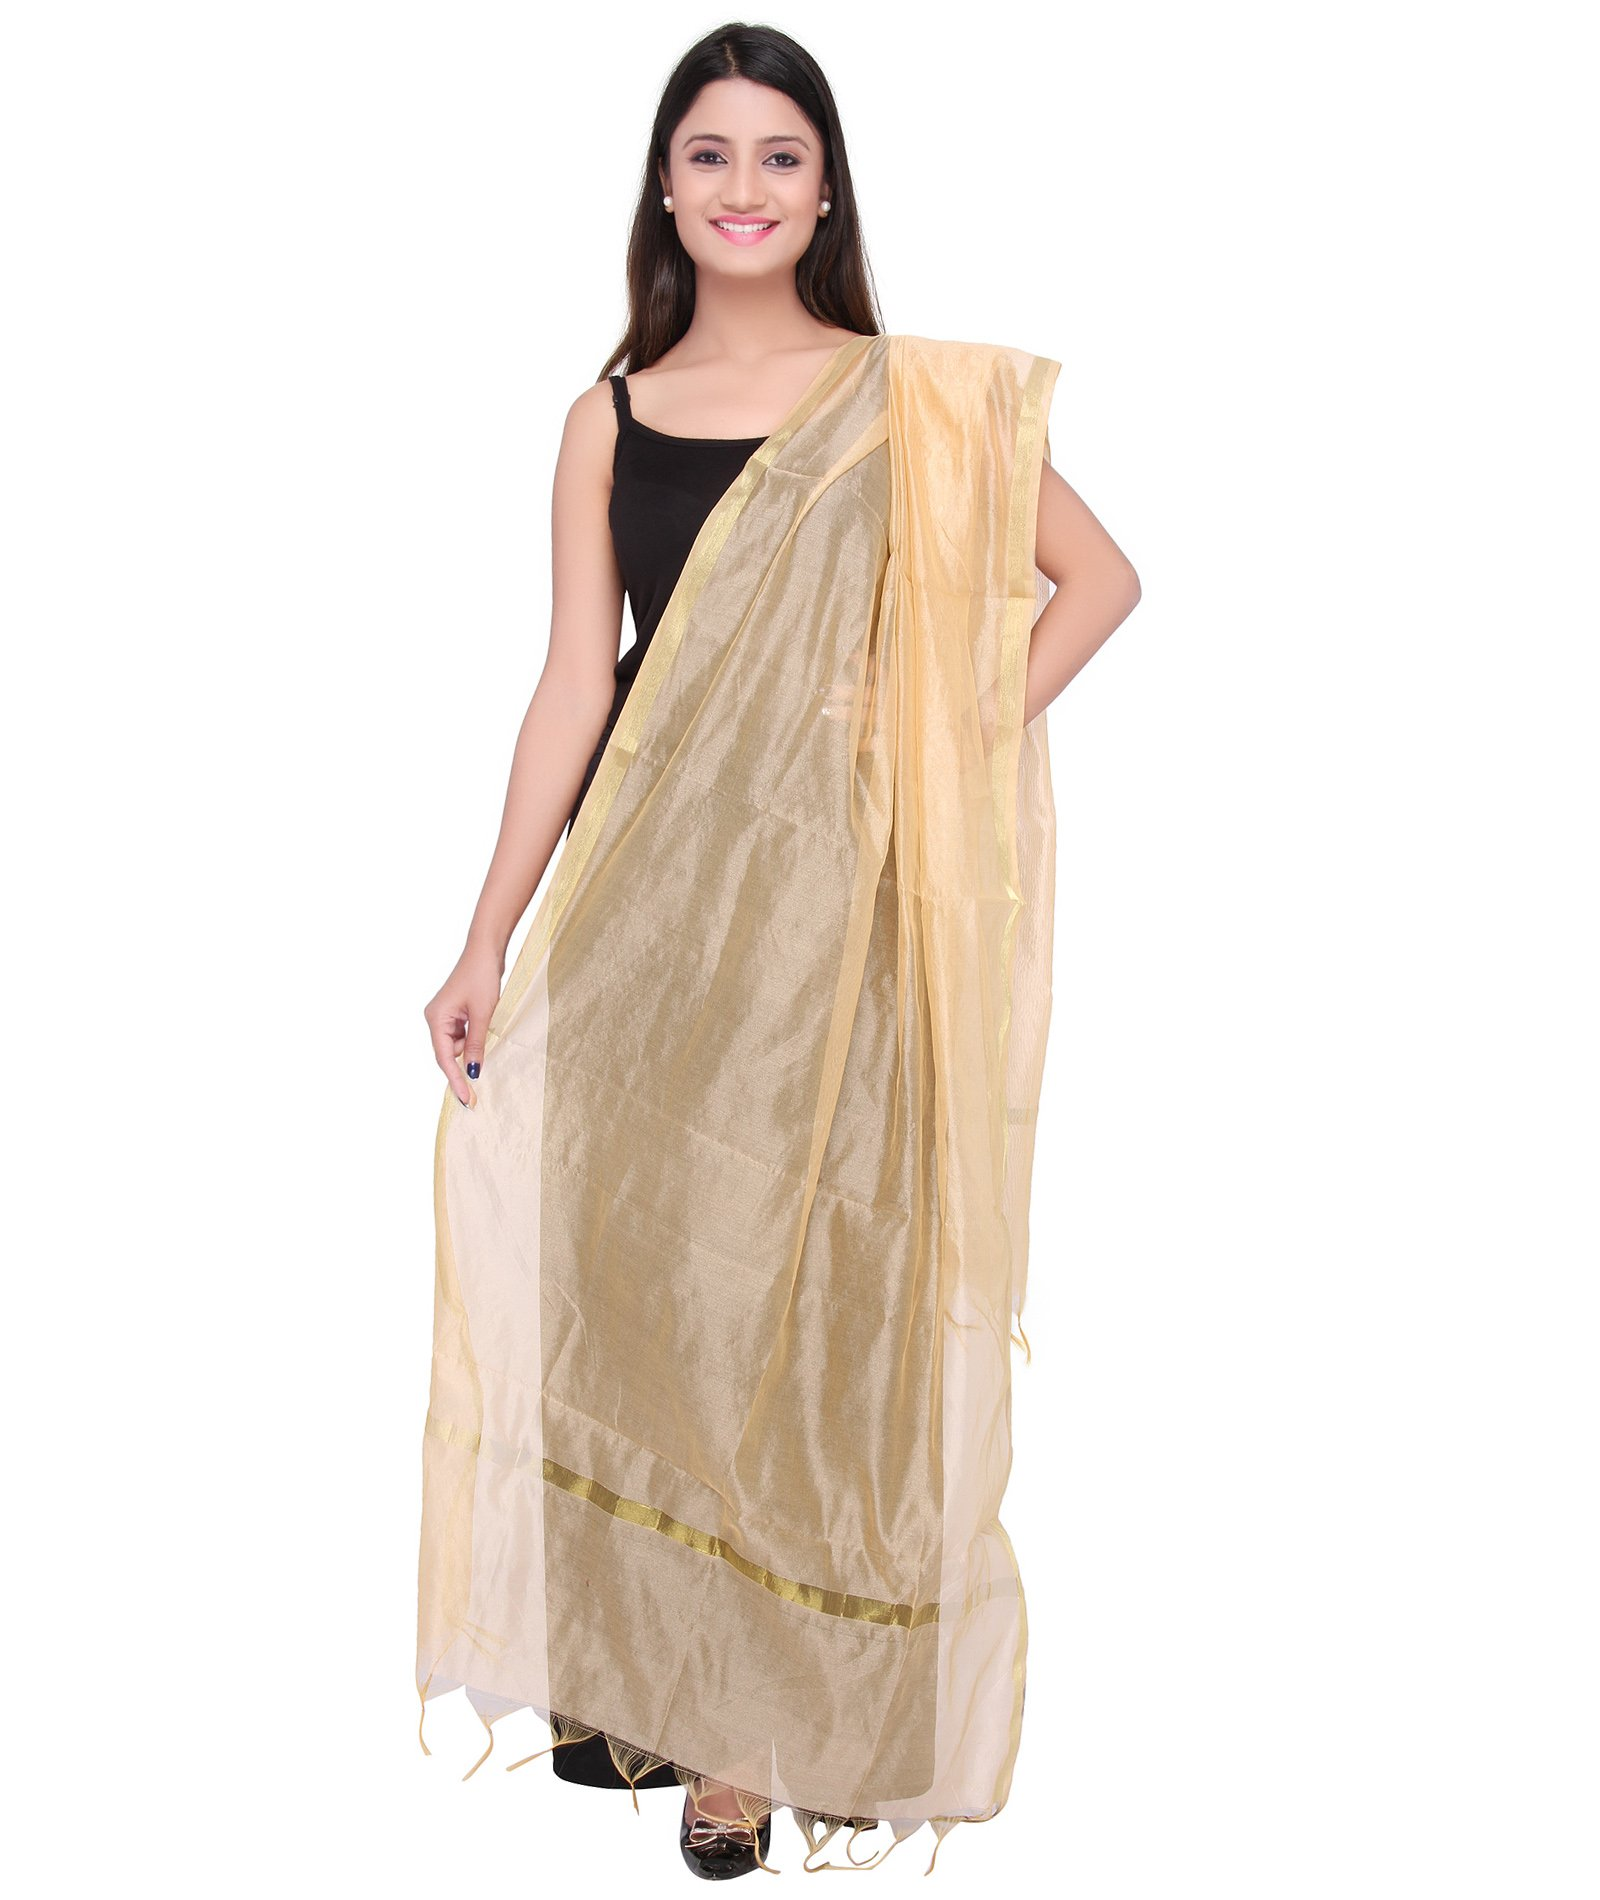 Dupatta Bazaar Indian Plain Beige Silk Dupatta ,Stole, Scarf, Chunni for Woman